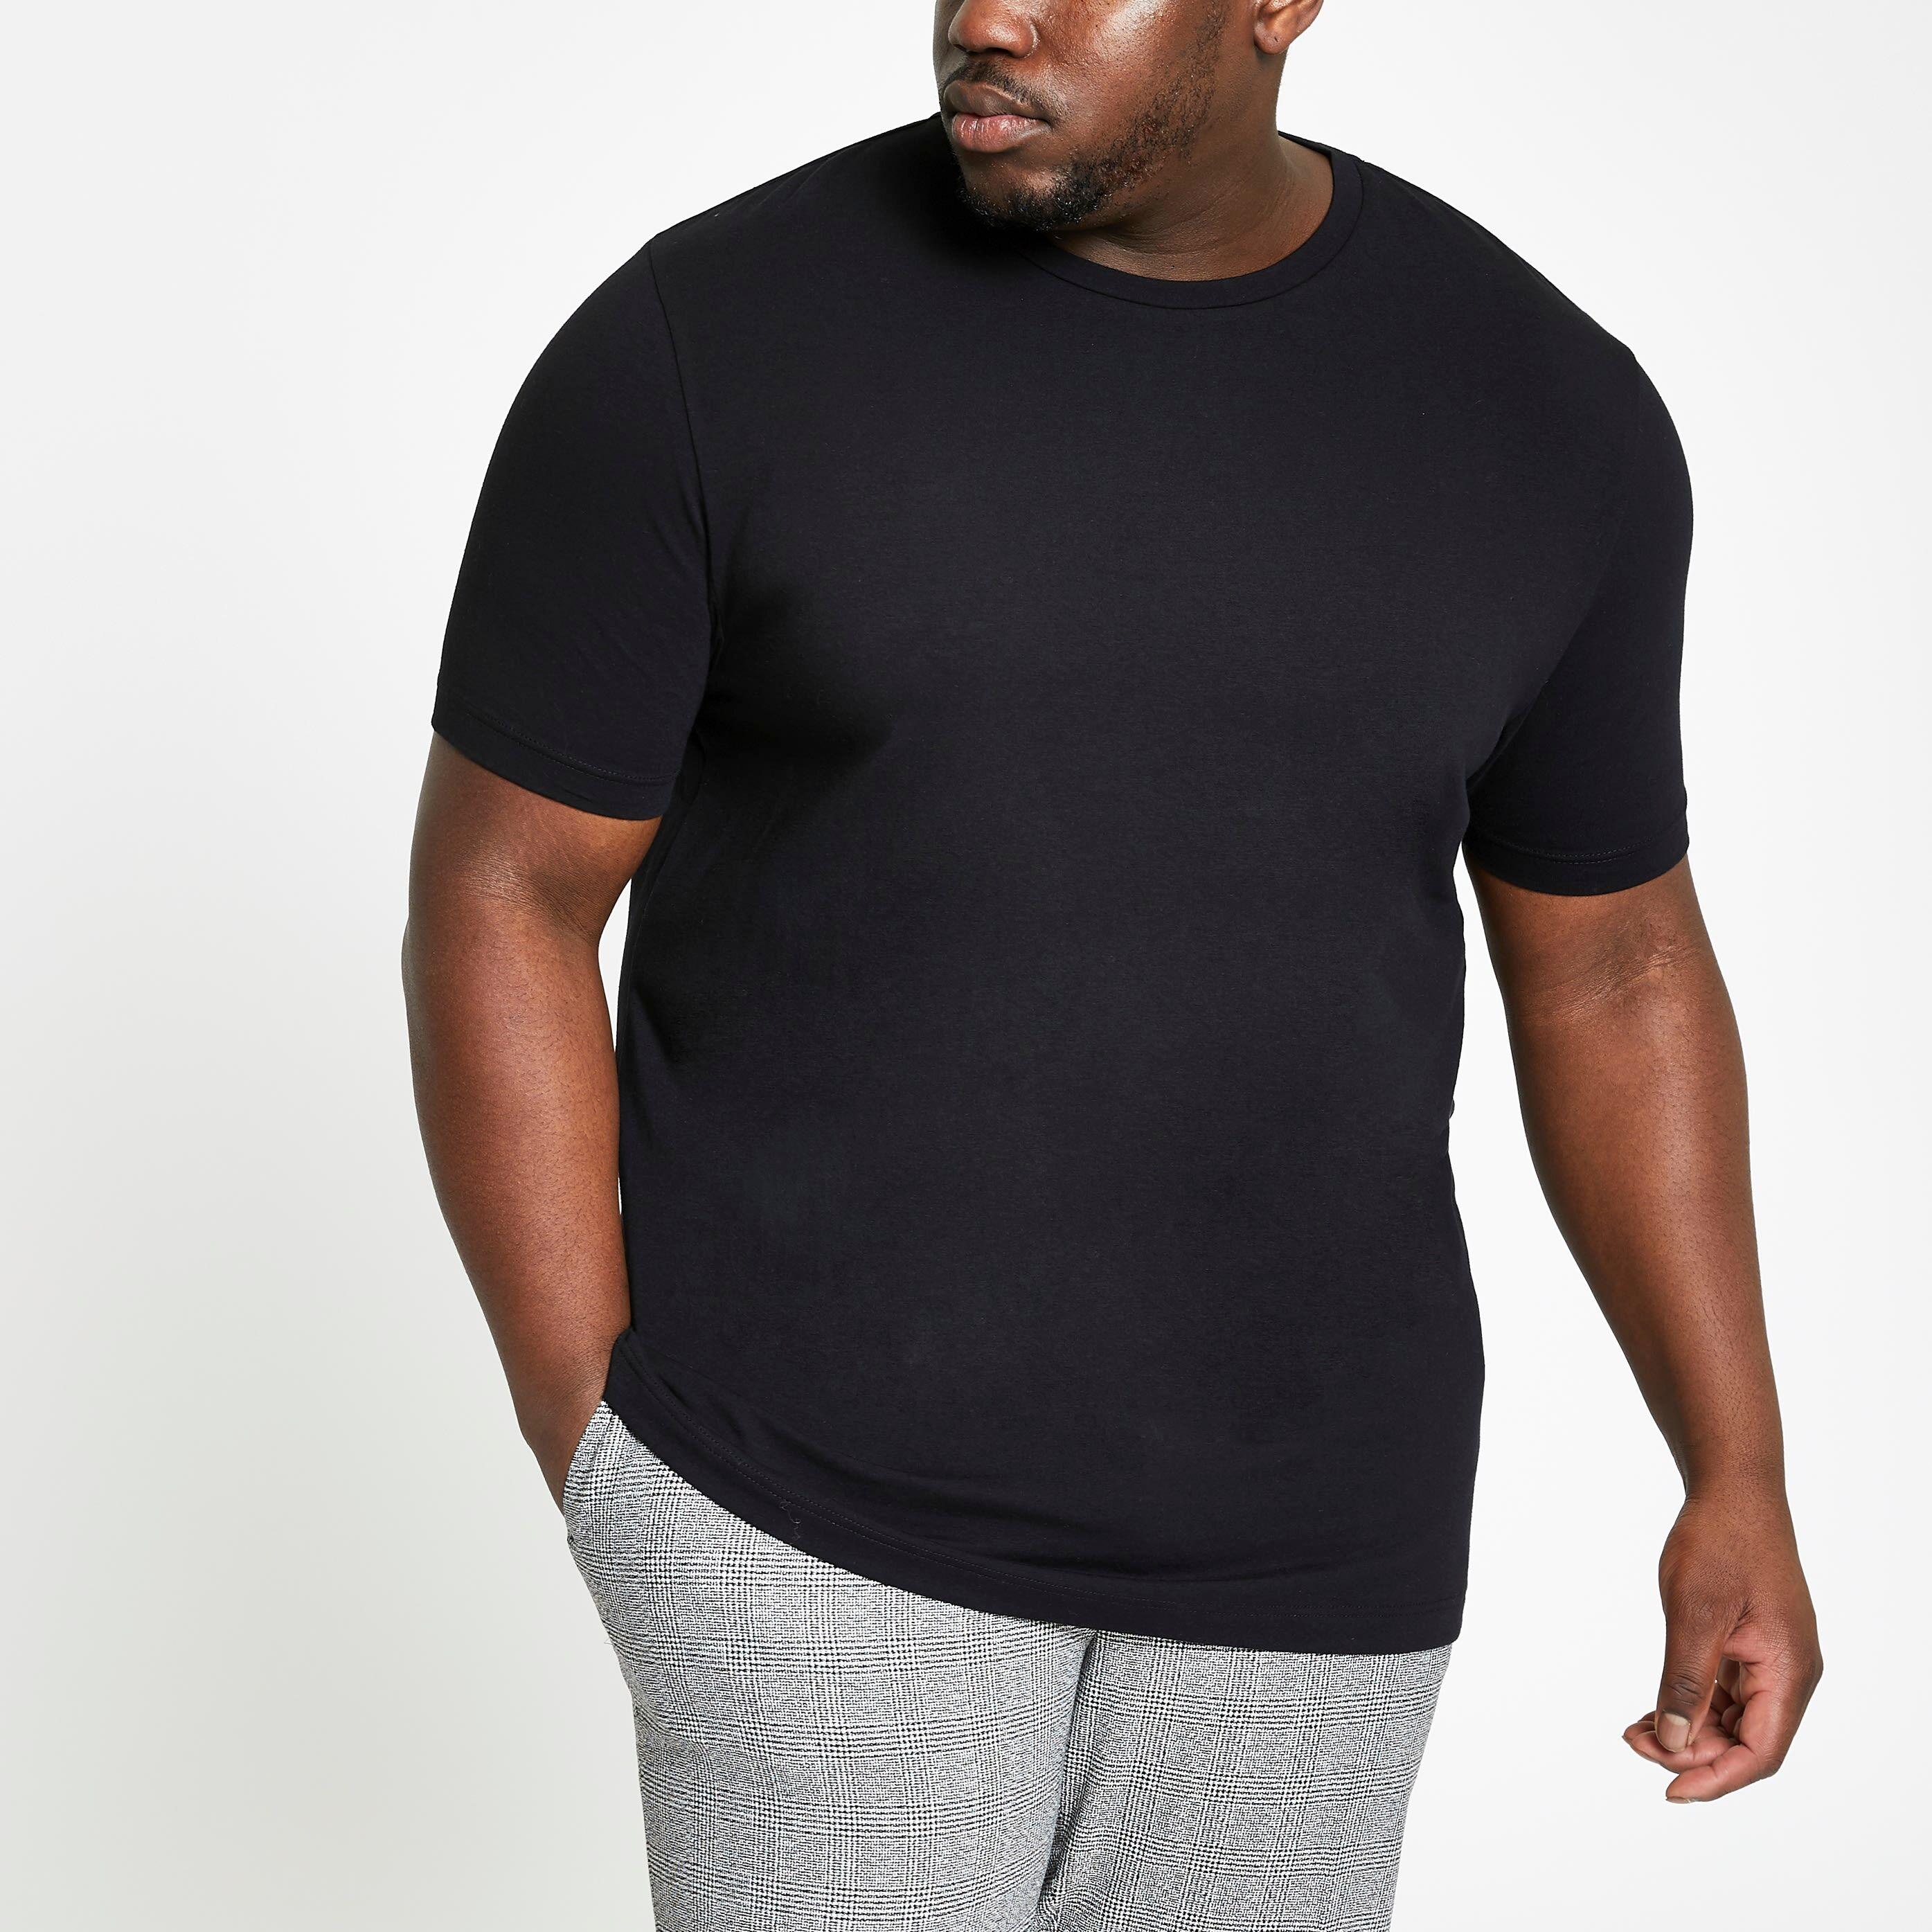 River Island Mens Big and Tall Black crew neck T-shirt (XXXXL)